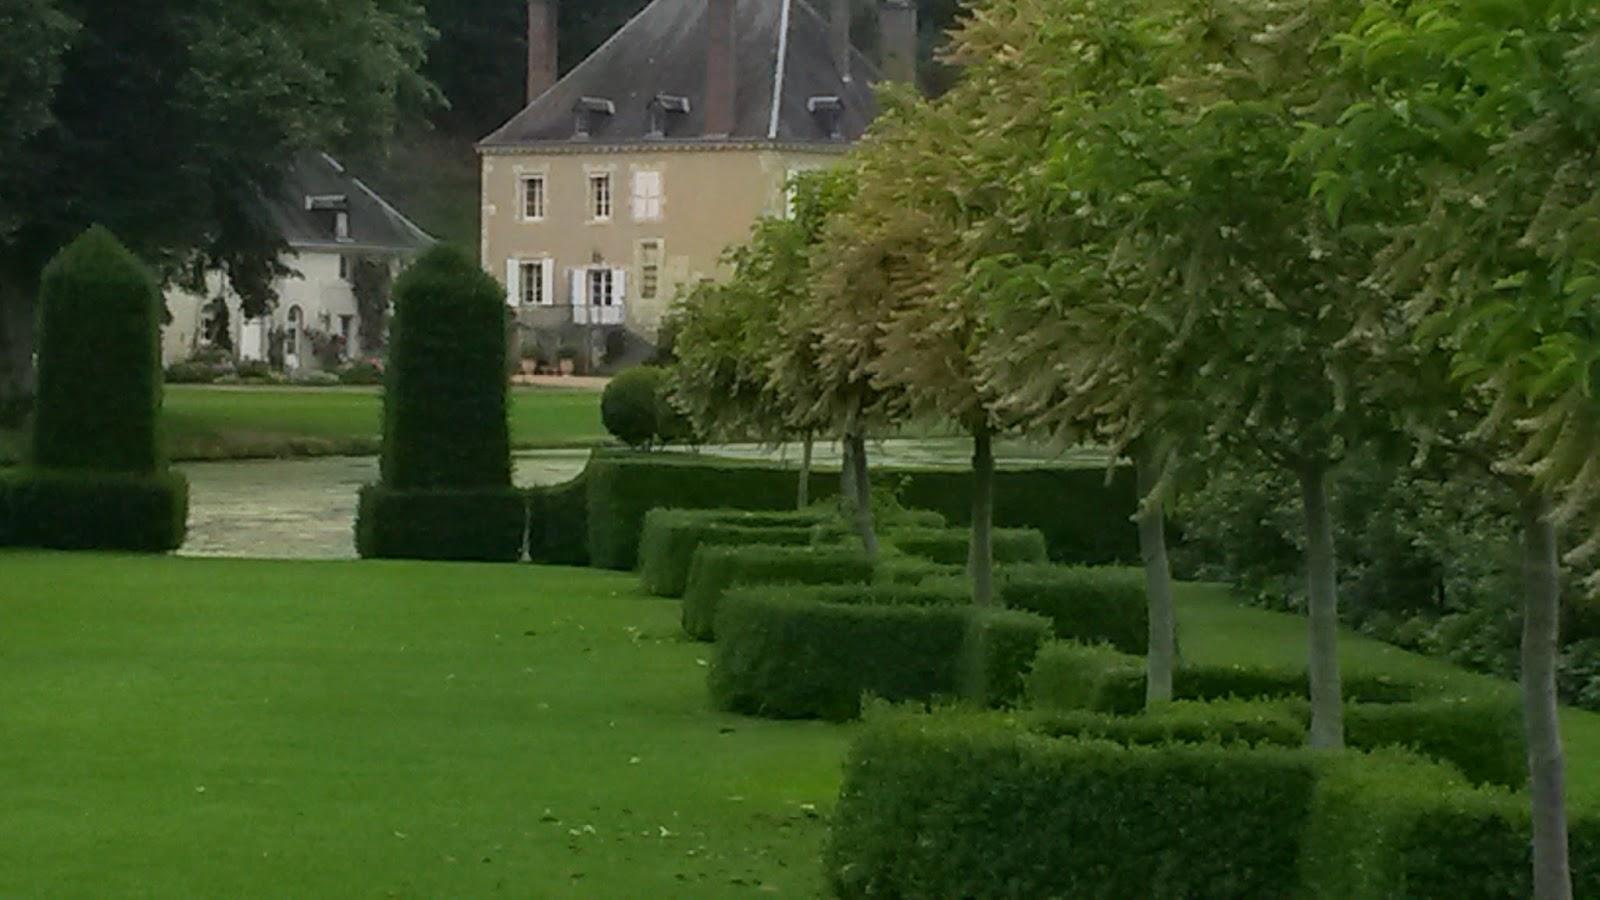 Nibelle et baudouin juin 2015 for Jardin remarquable 2015